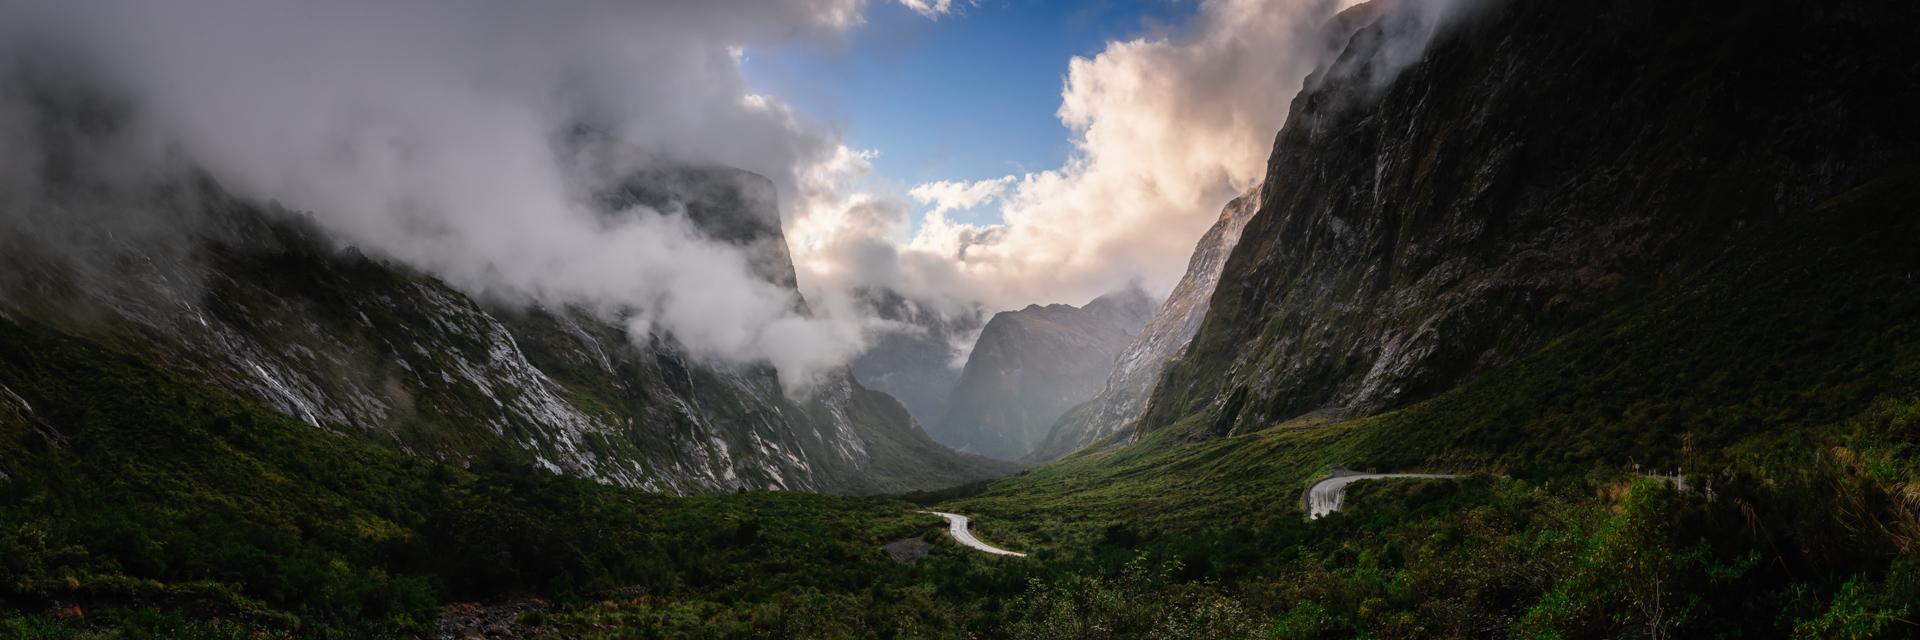 Gate to The Fiordland, Fiordland National Park, 2017